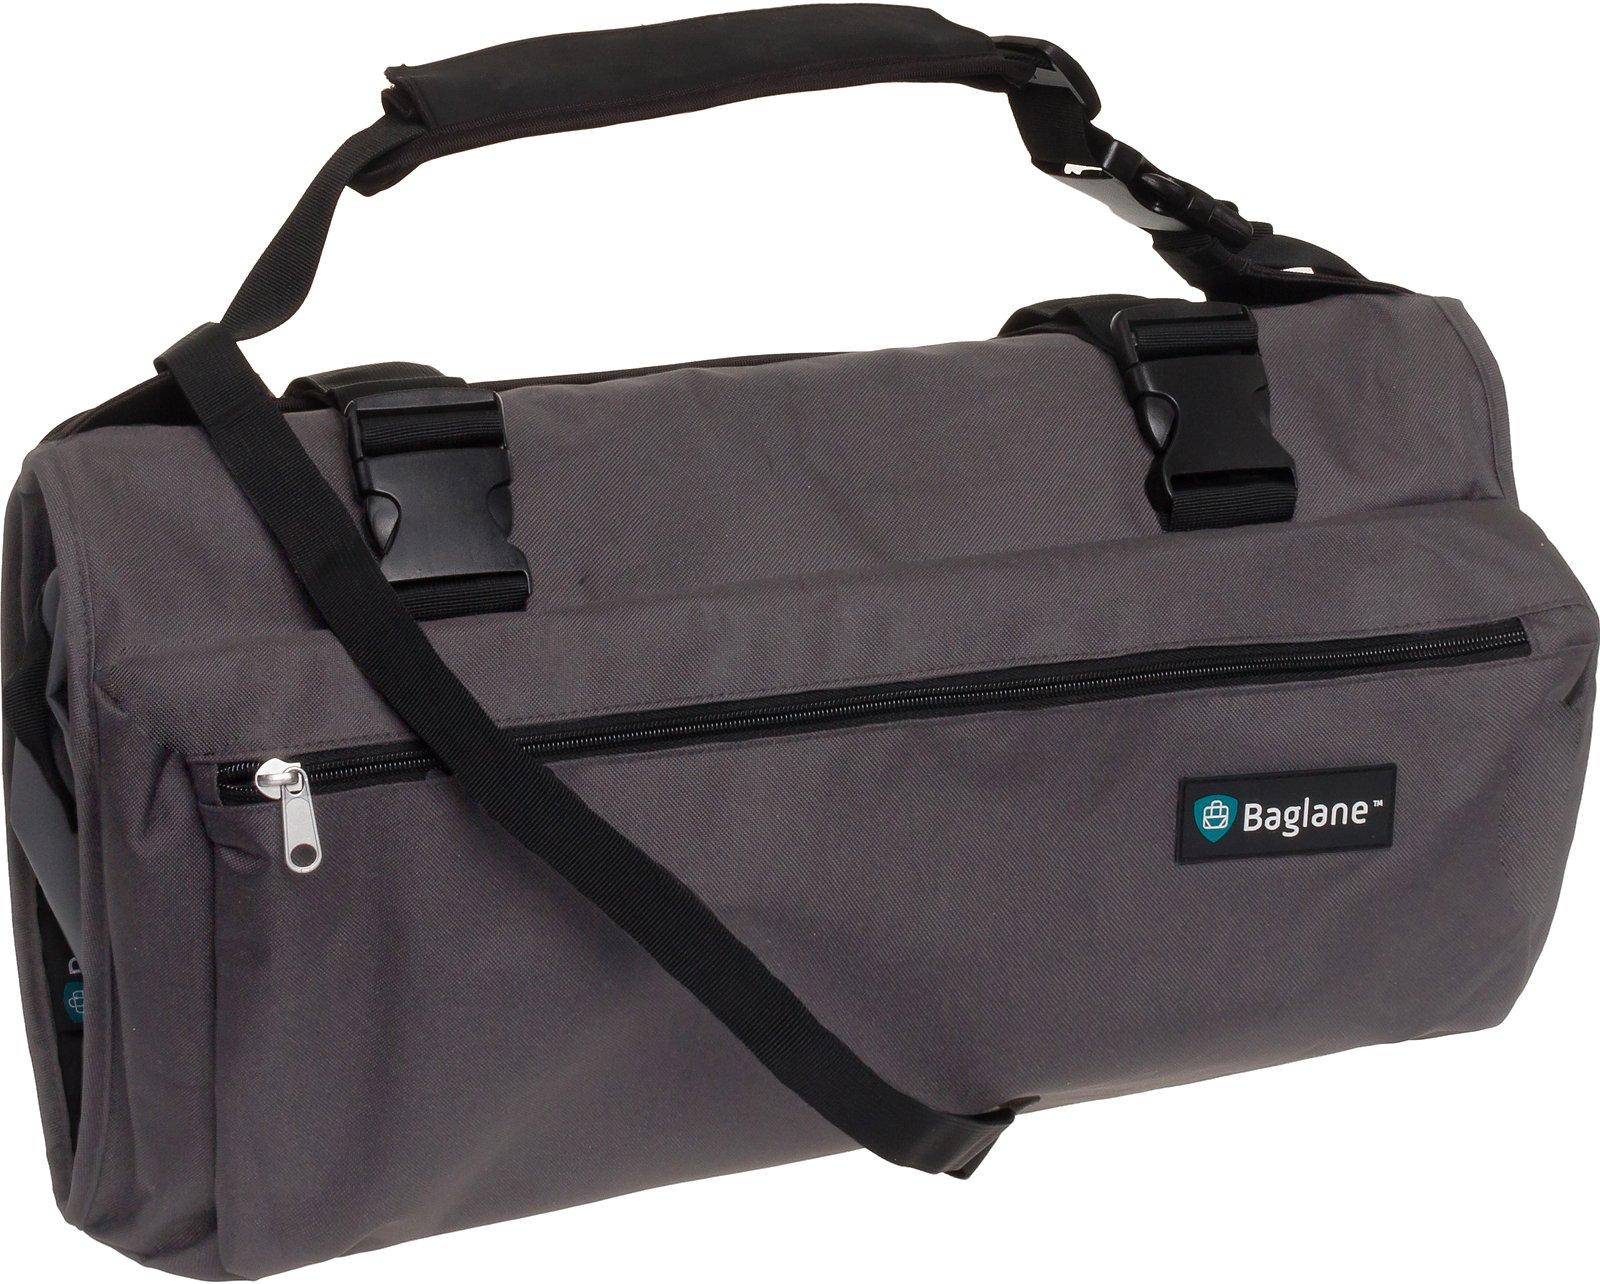 Baglane Garment Suit Bag by Travel Carry On Garment Bag (Grey)